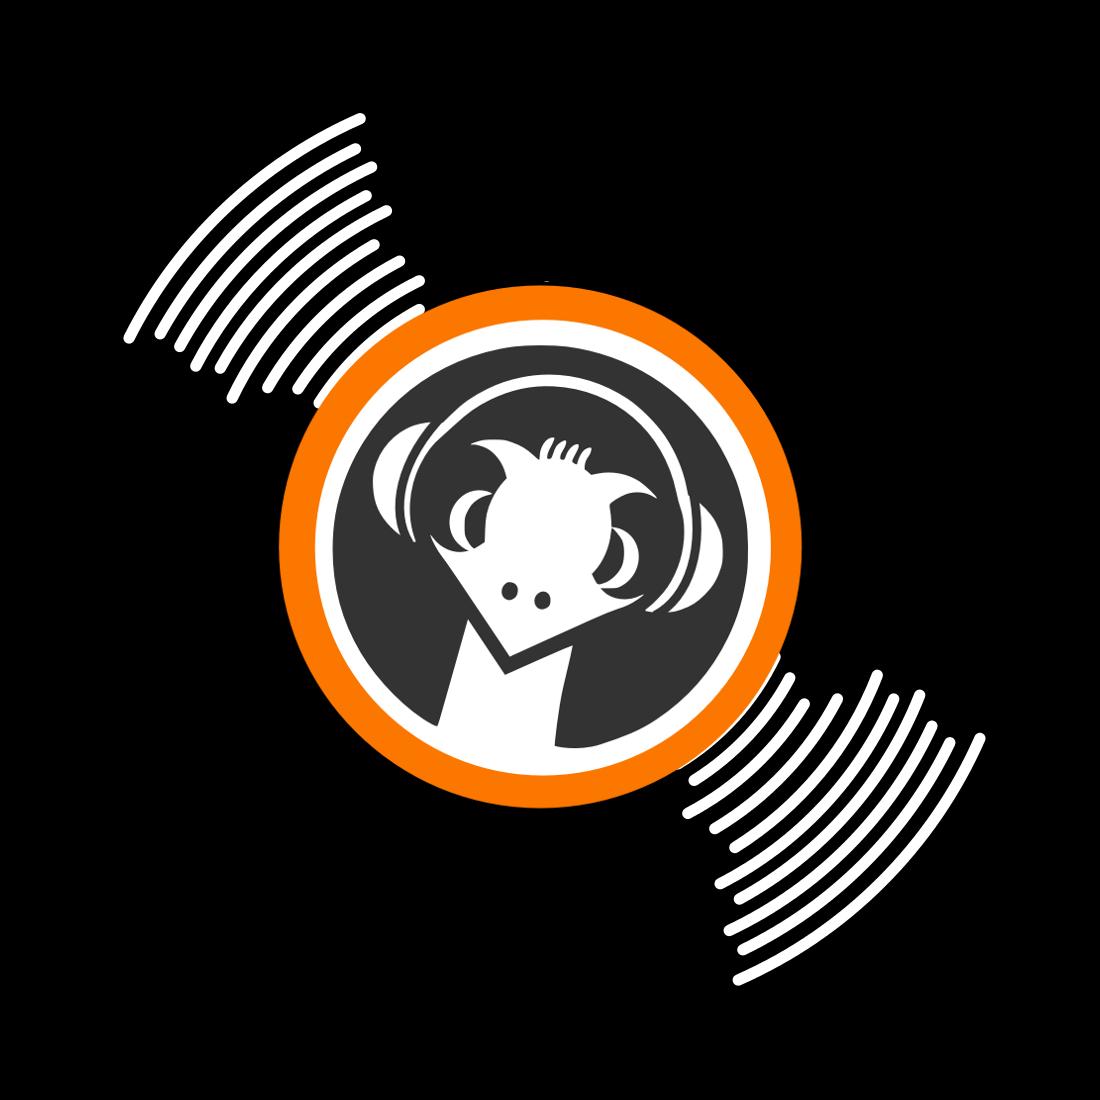 [BEN] ANGSTPROD LP 01 Virtual Environnement